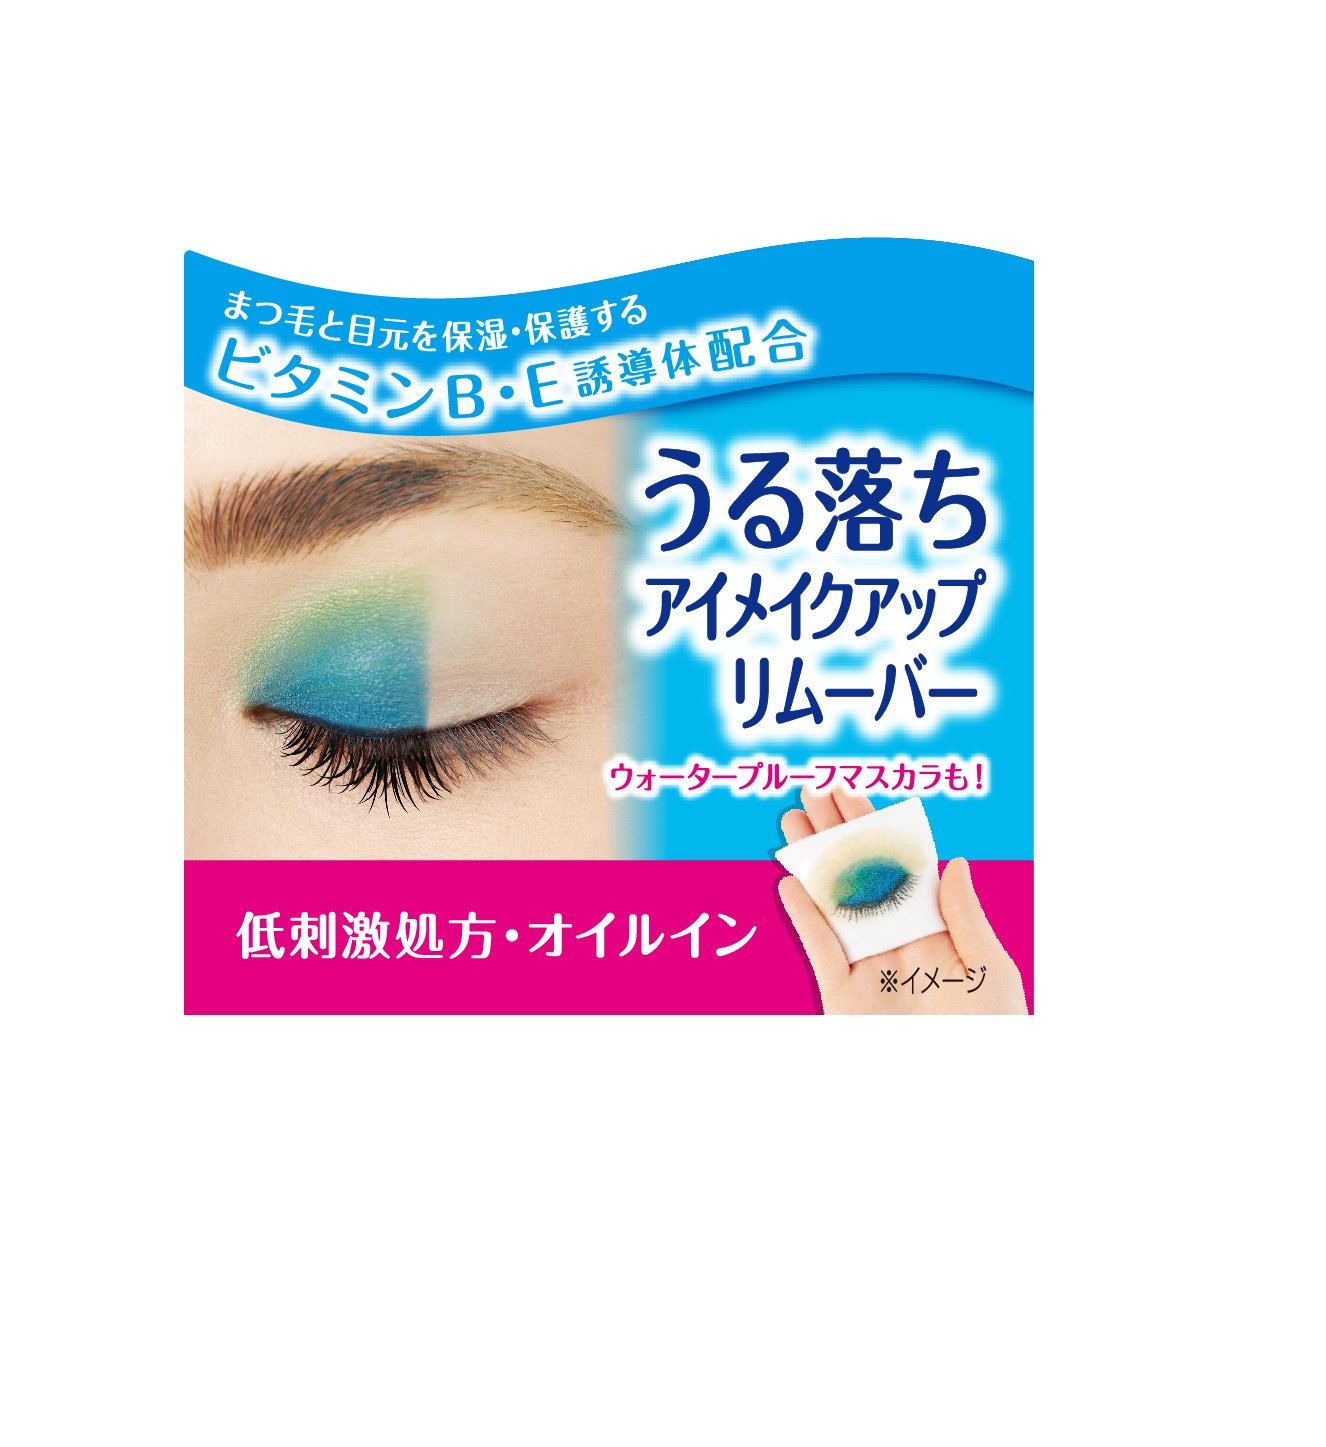 Bifesta Mandom Eye Makeup Remover, 145ml by Bifesta (Image #3)